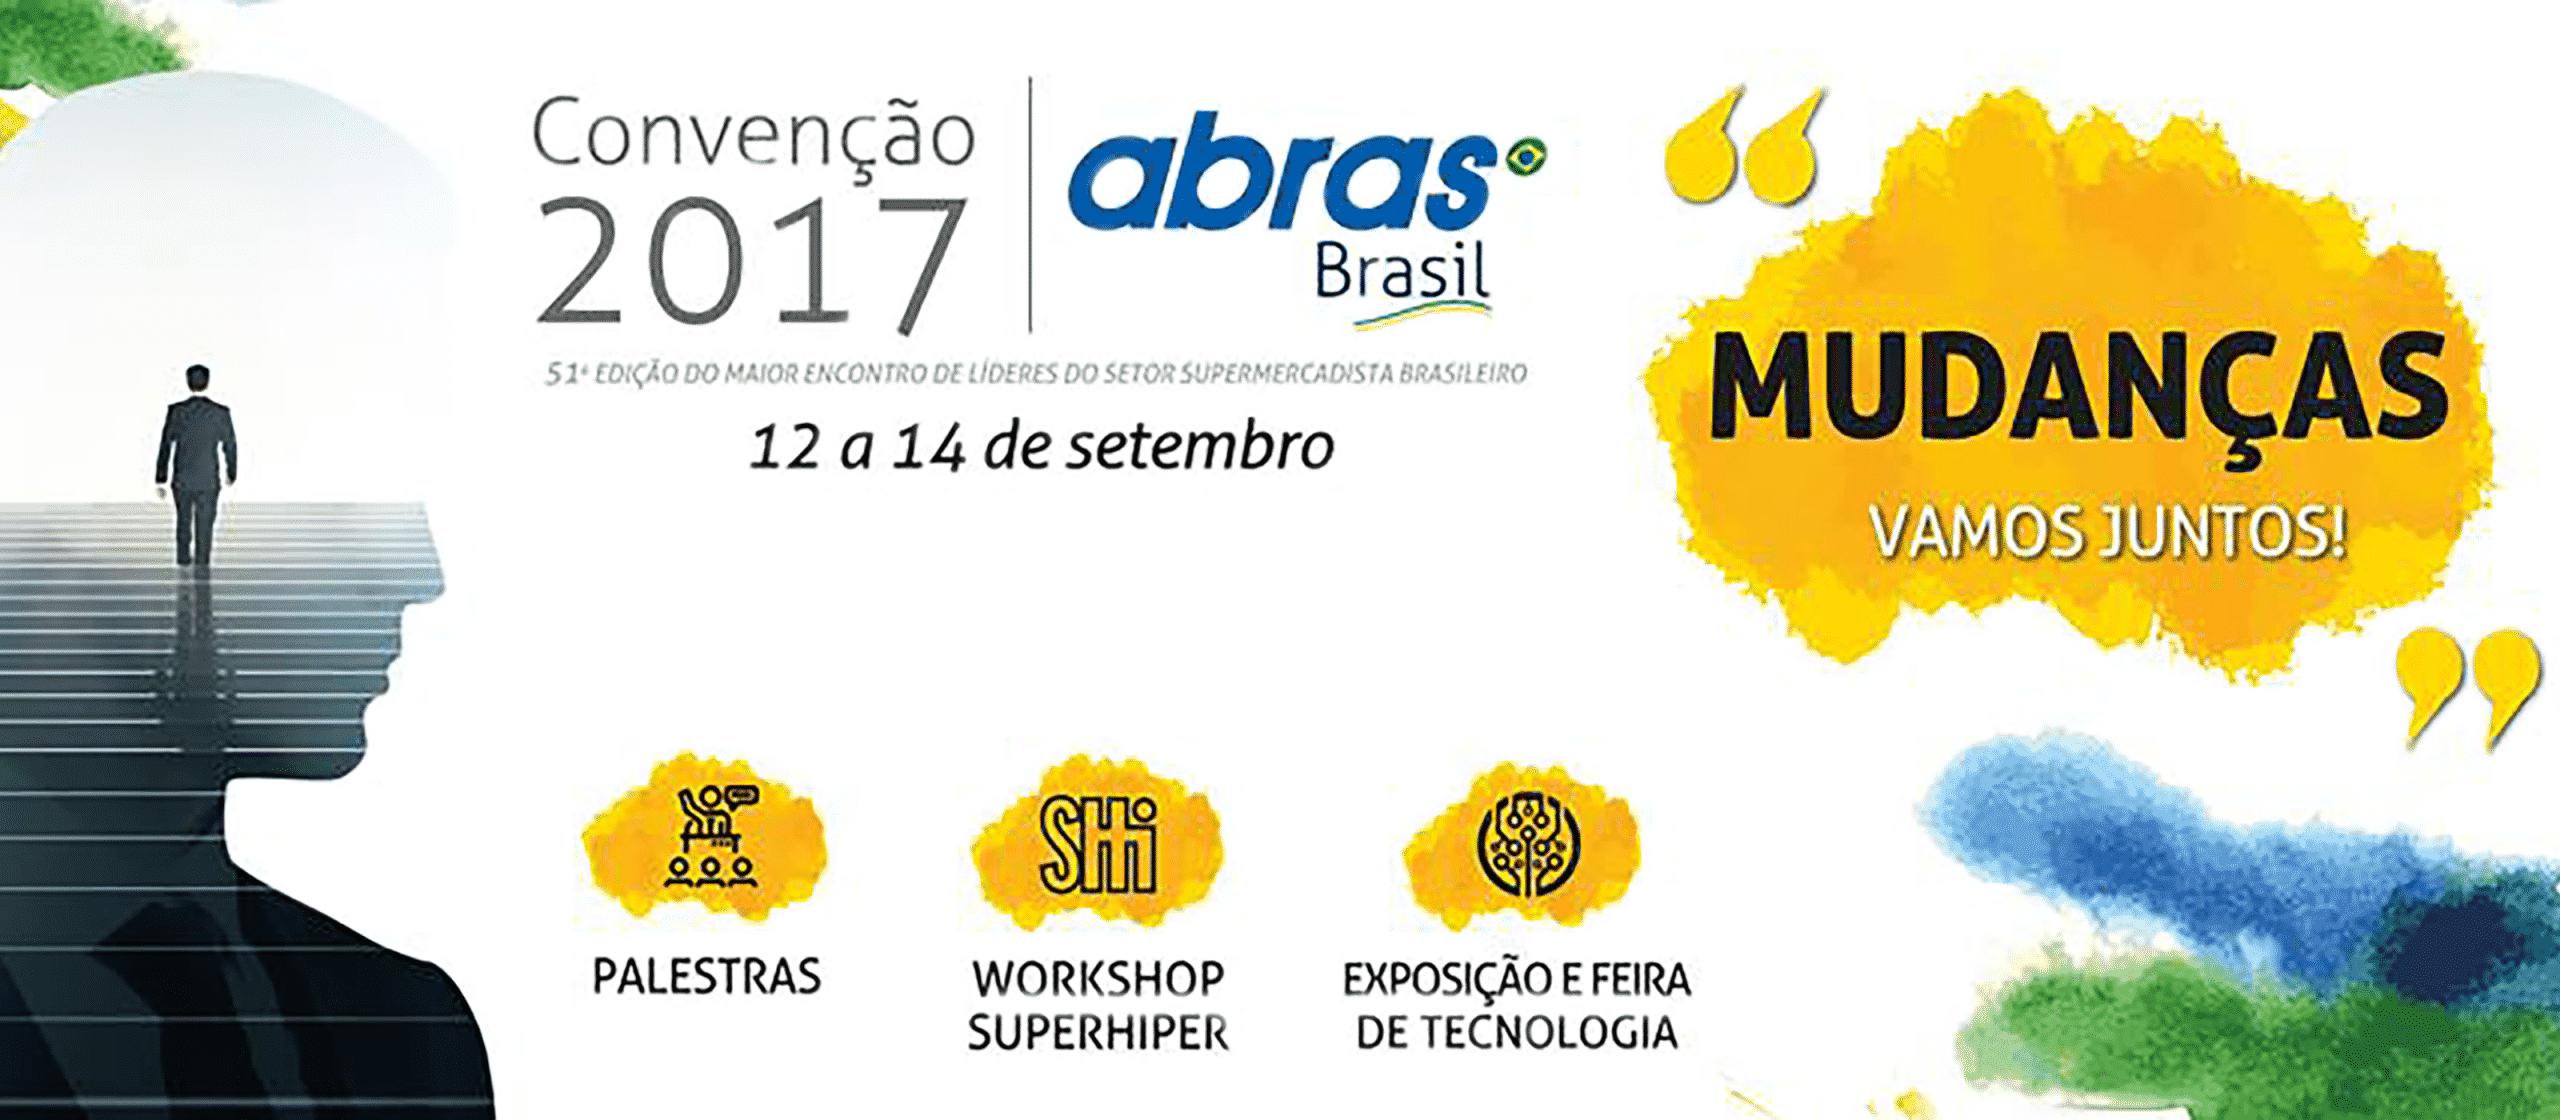 No evento ABRAS 2017, descubra a suite sisqual workforce management no estande #9